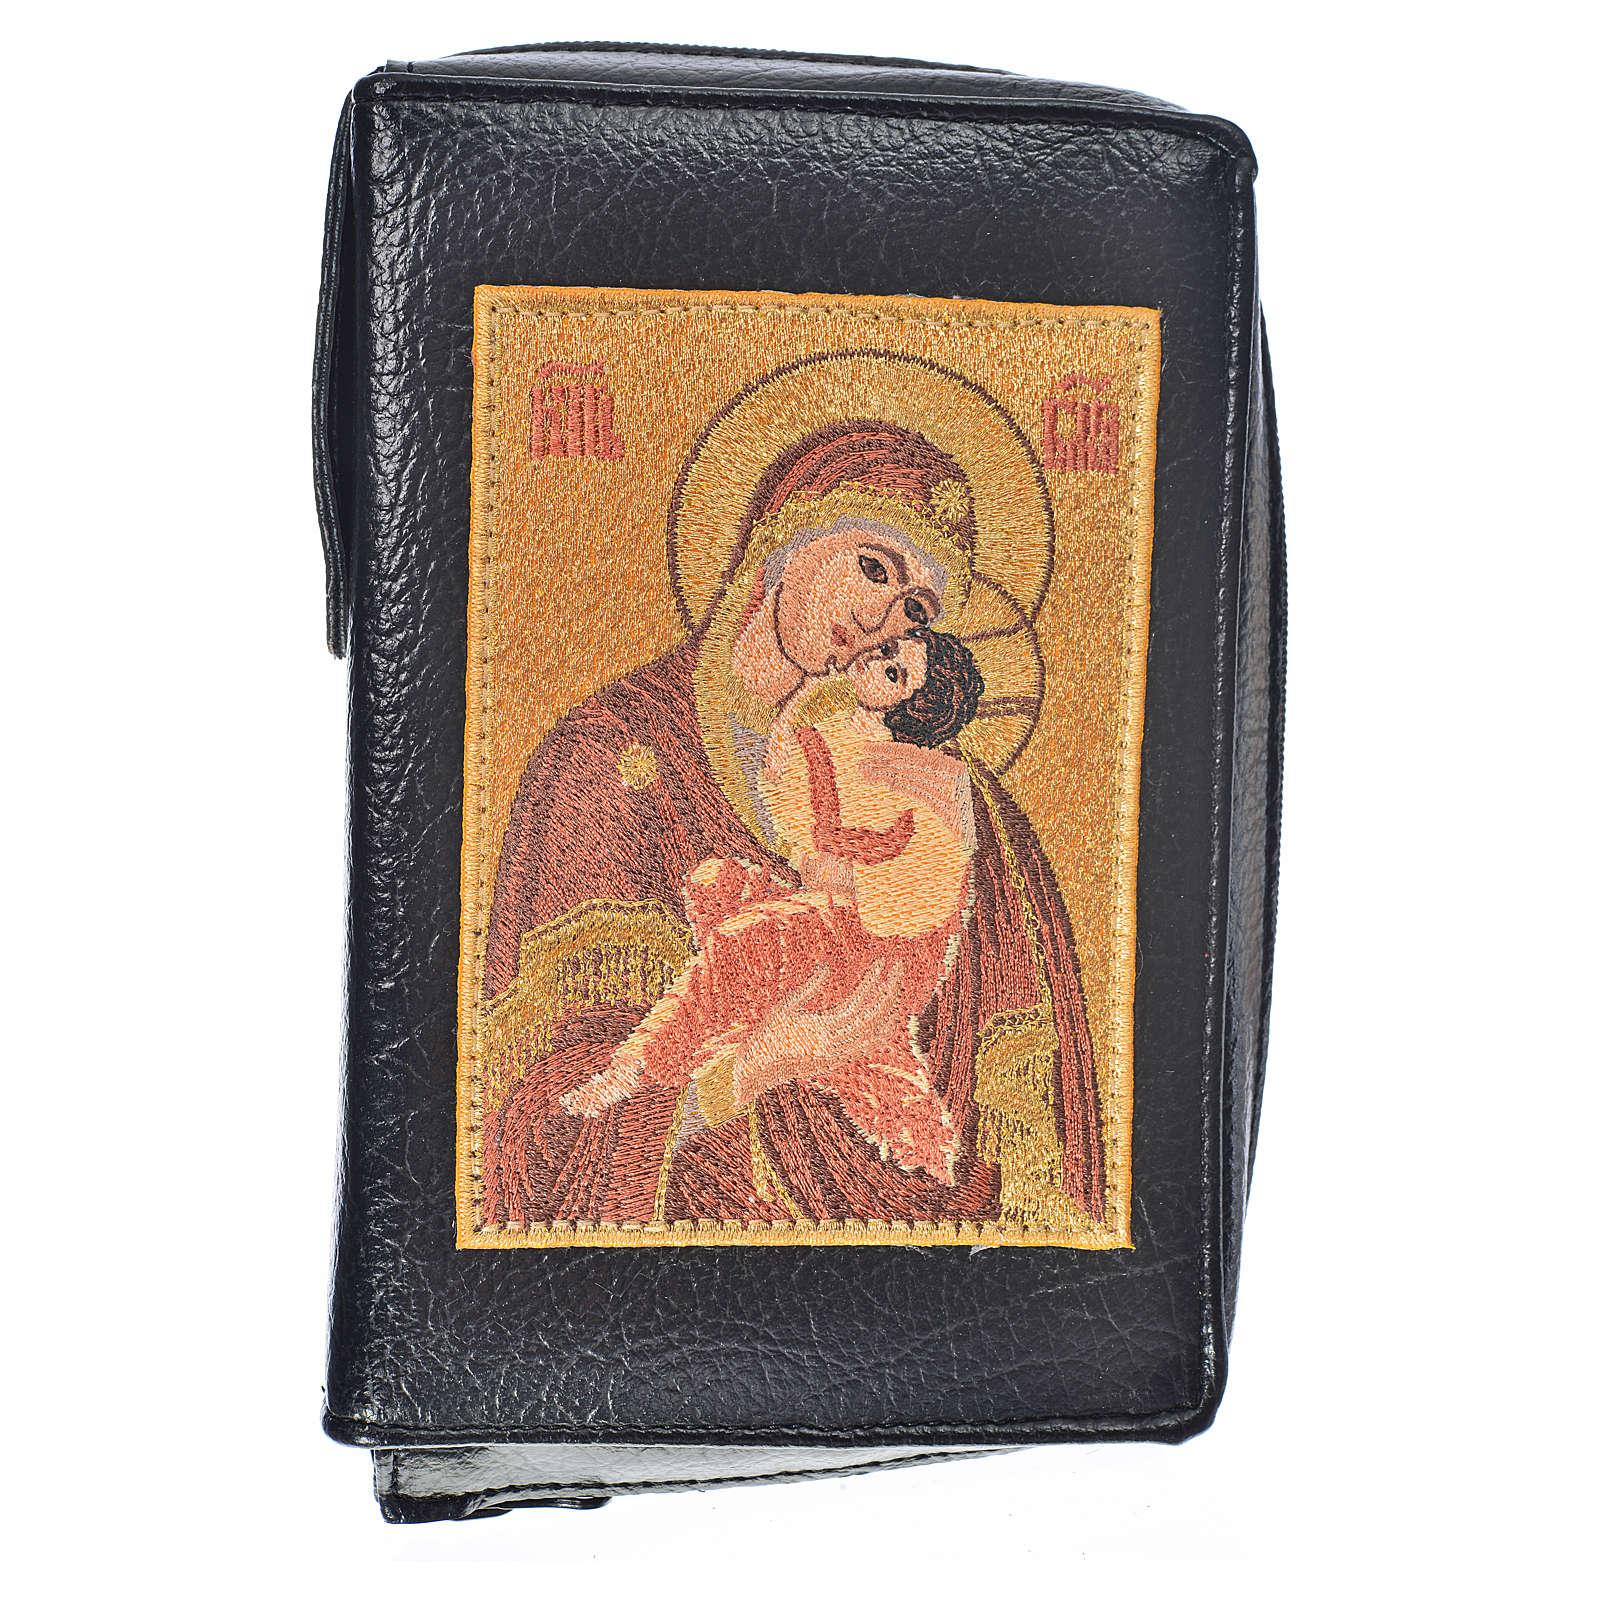 Funda Biblia Jerusalén Nueva Ed. negro simil cuero Virgen Ternura 4